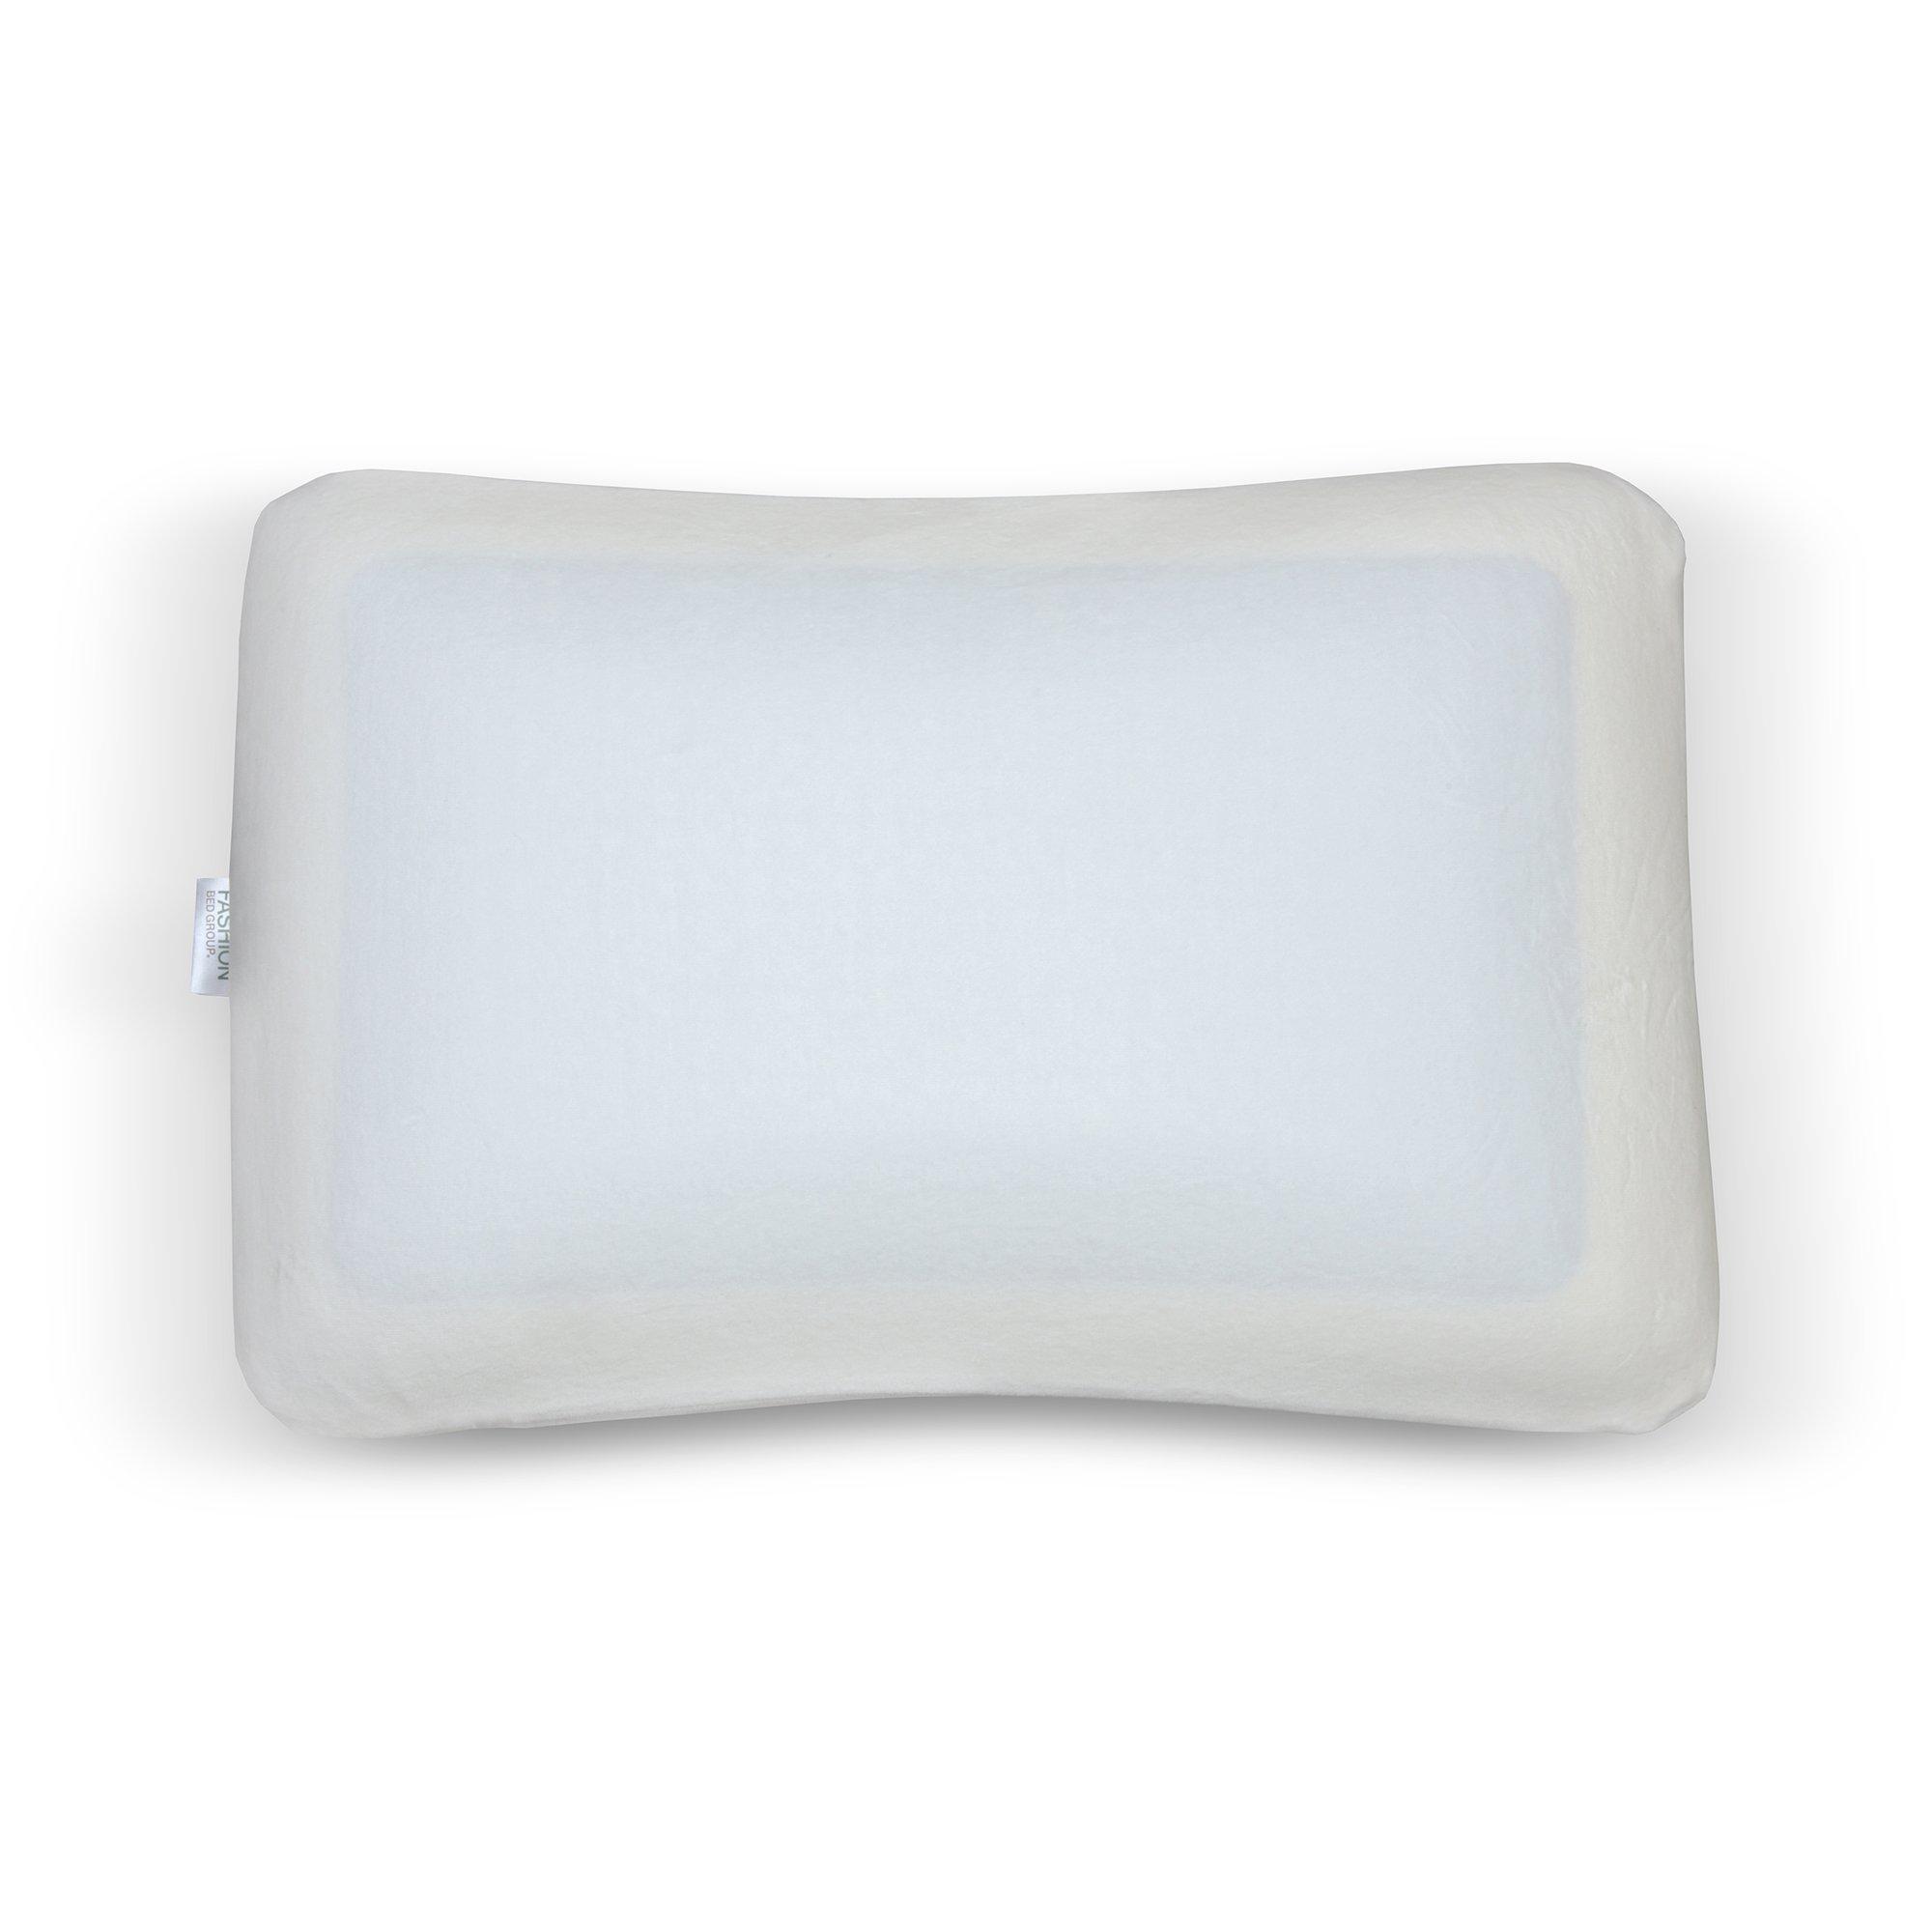 Fashion Bed Group Sleep Chill Gel Memory Foam Pillow, Standard/Queen